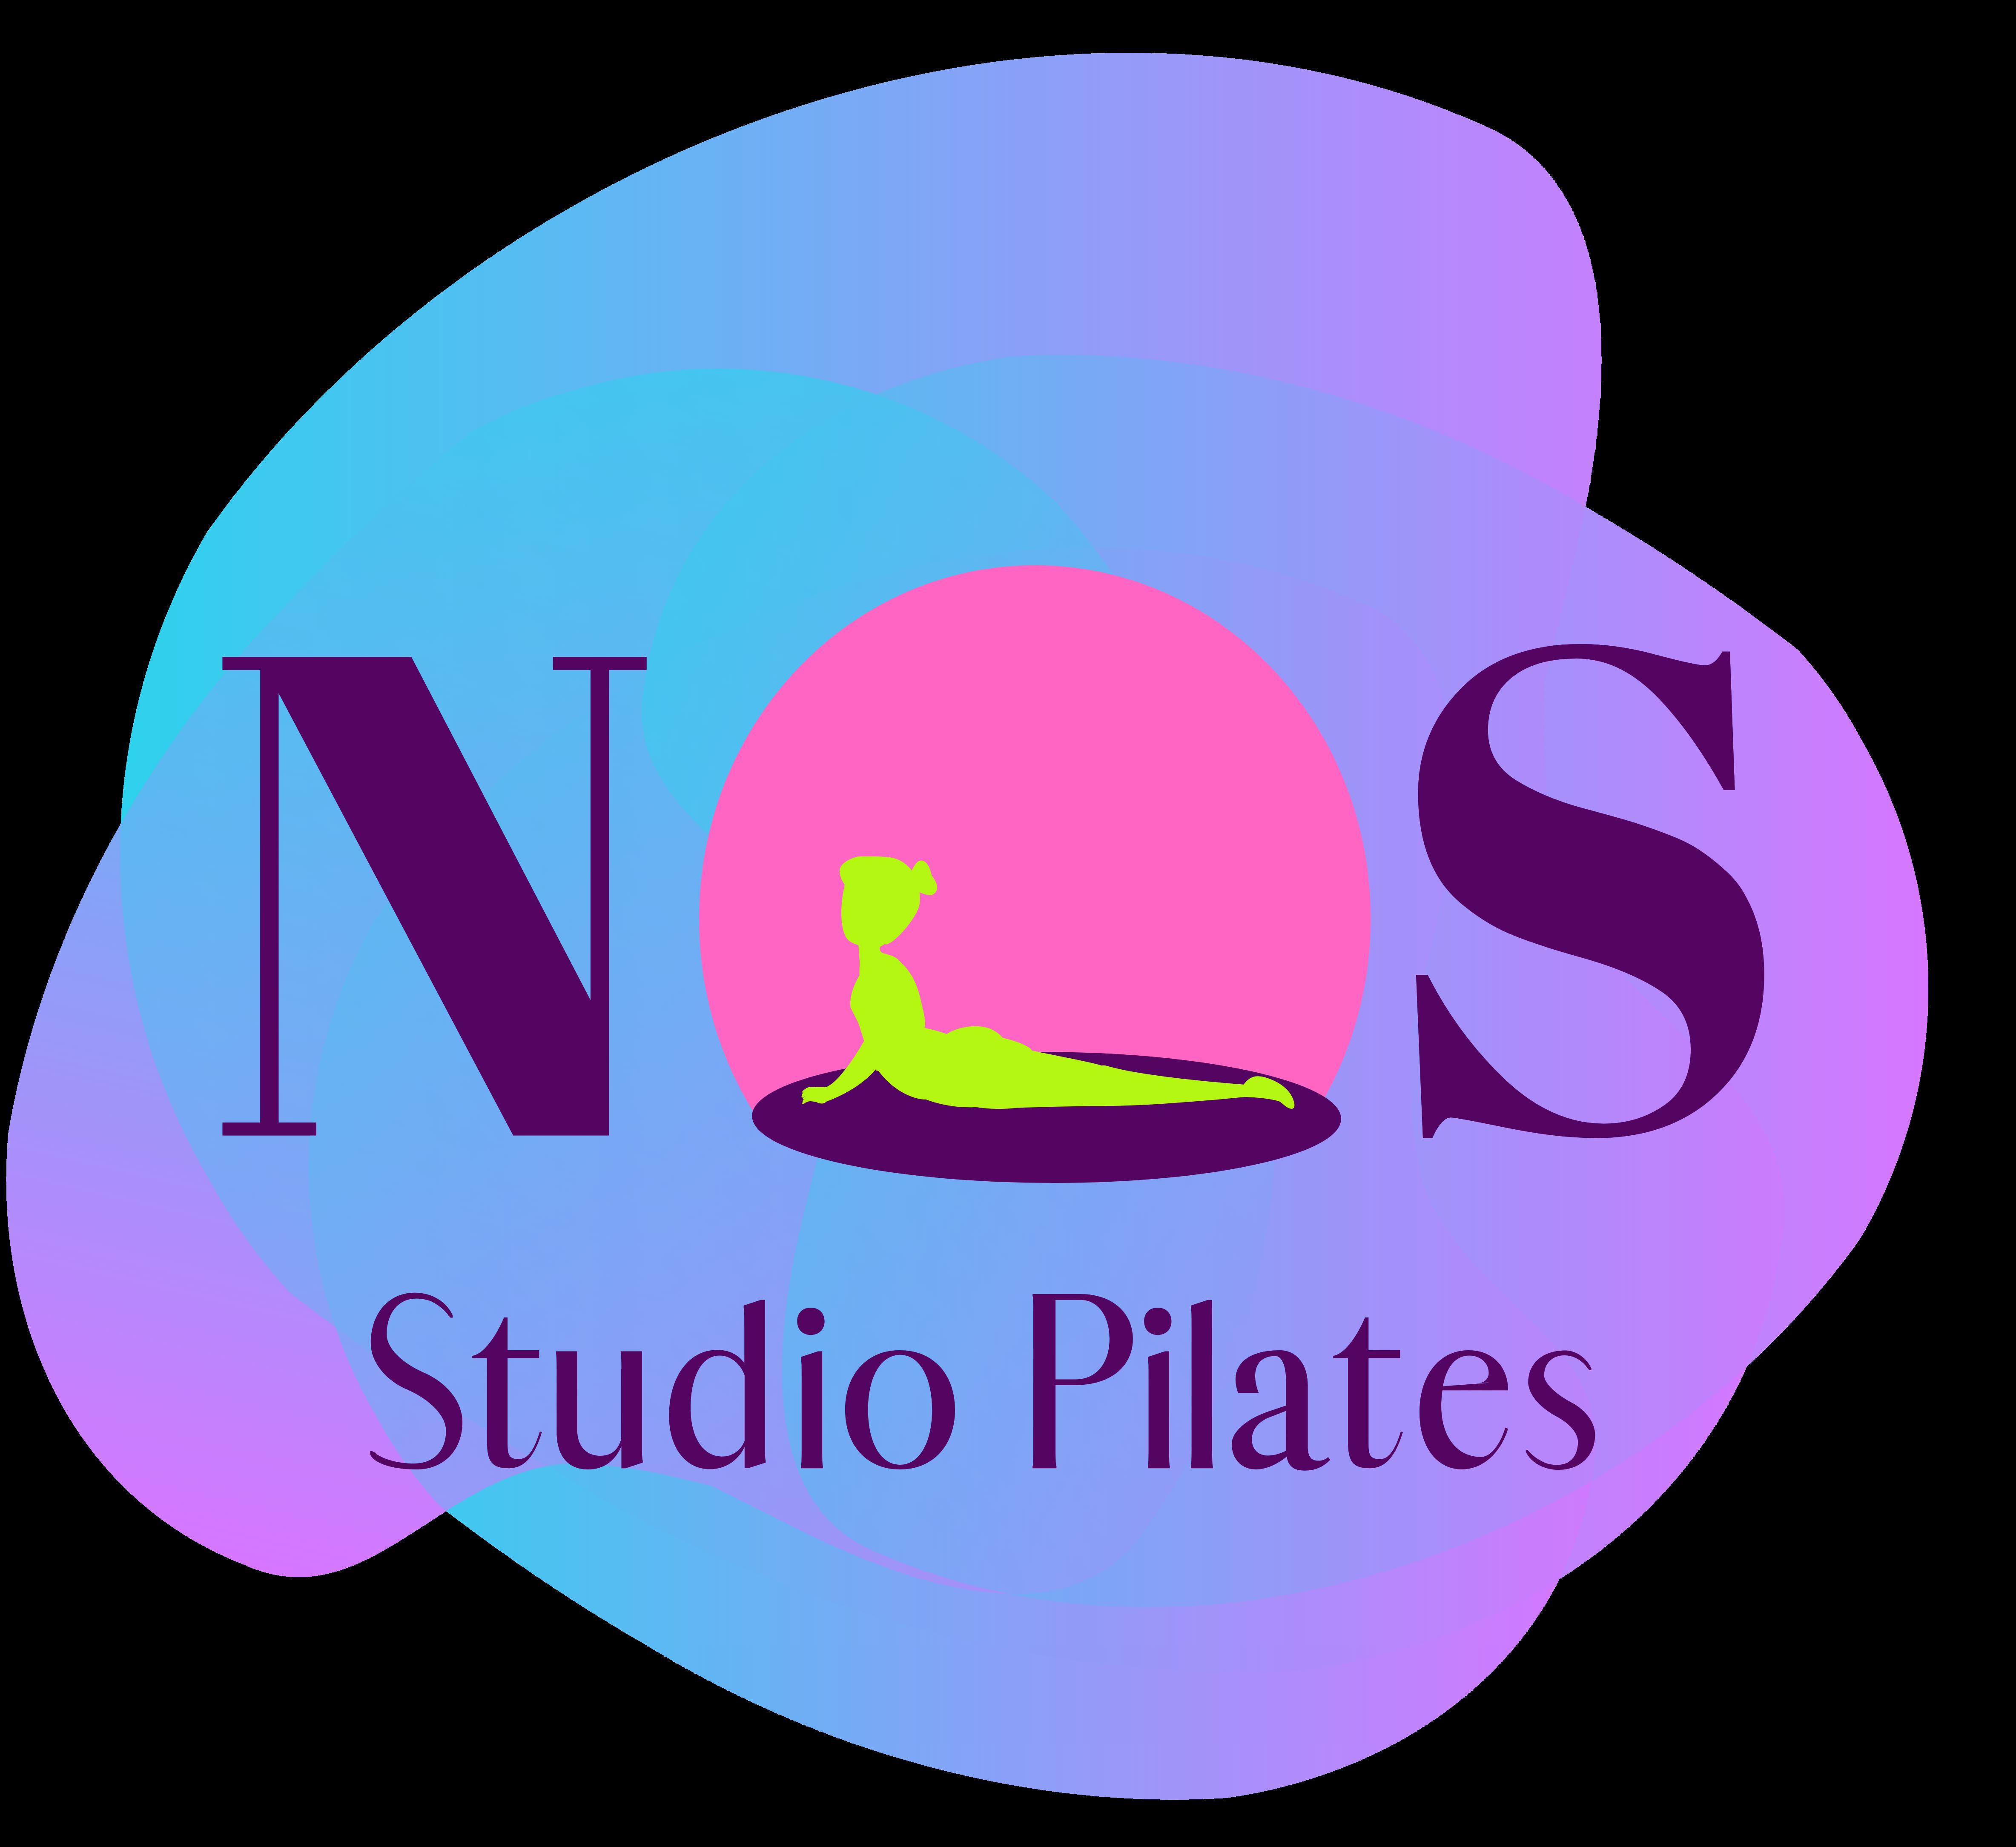 NOS STUDIO PILATES